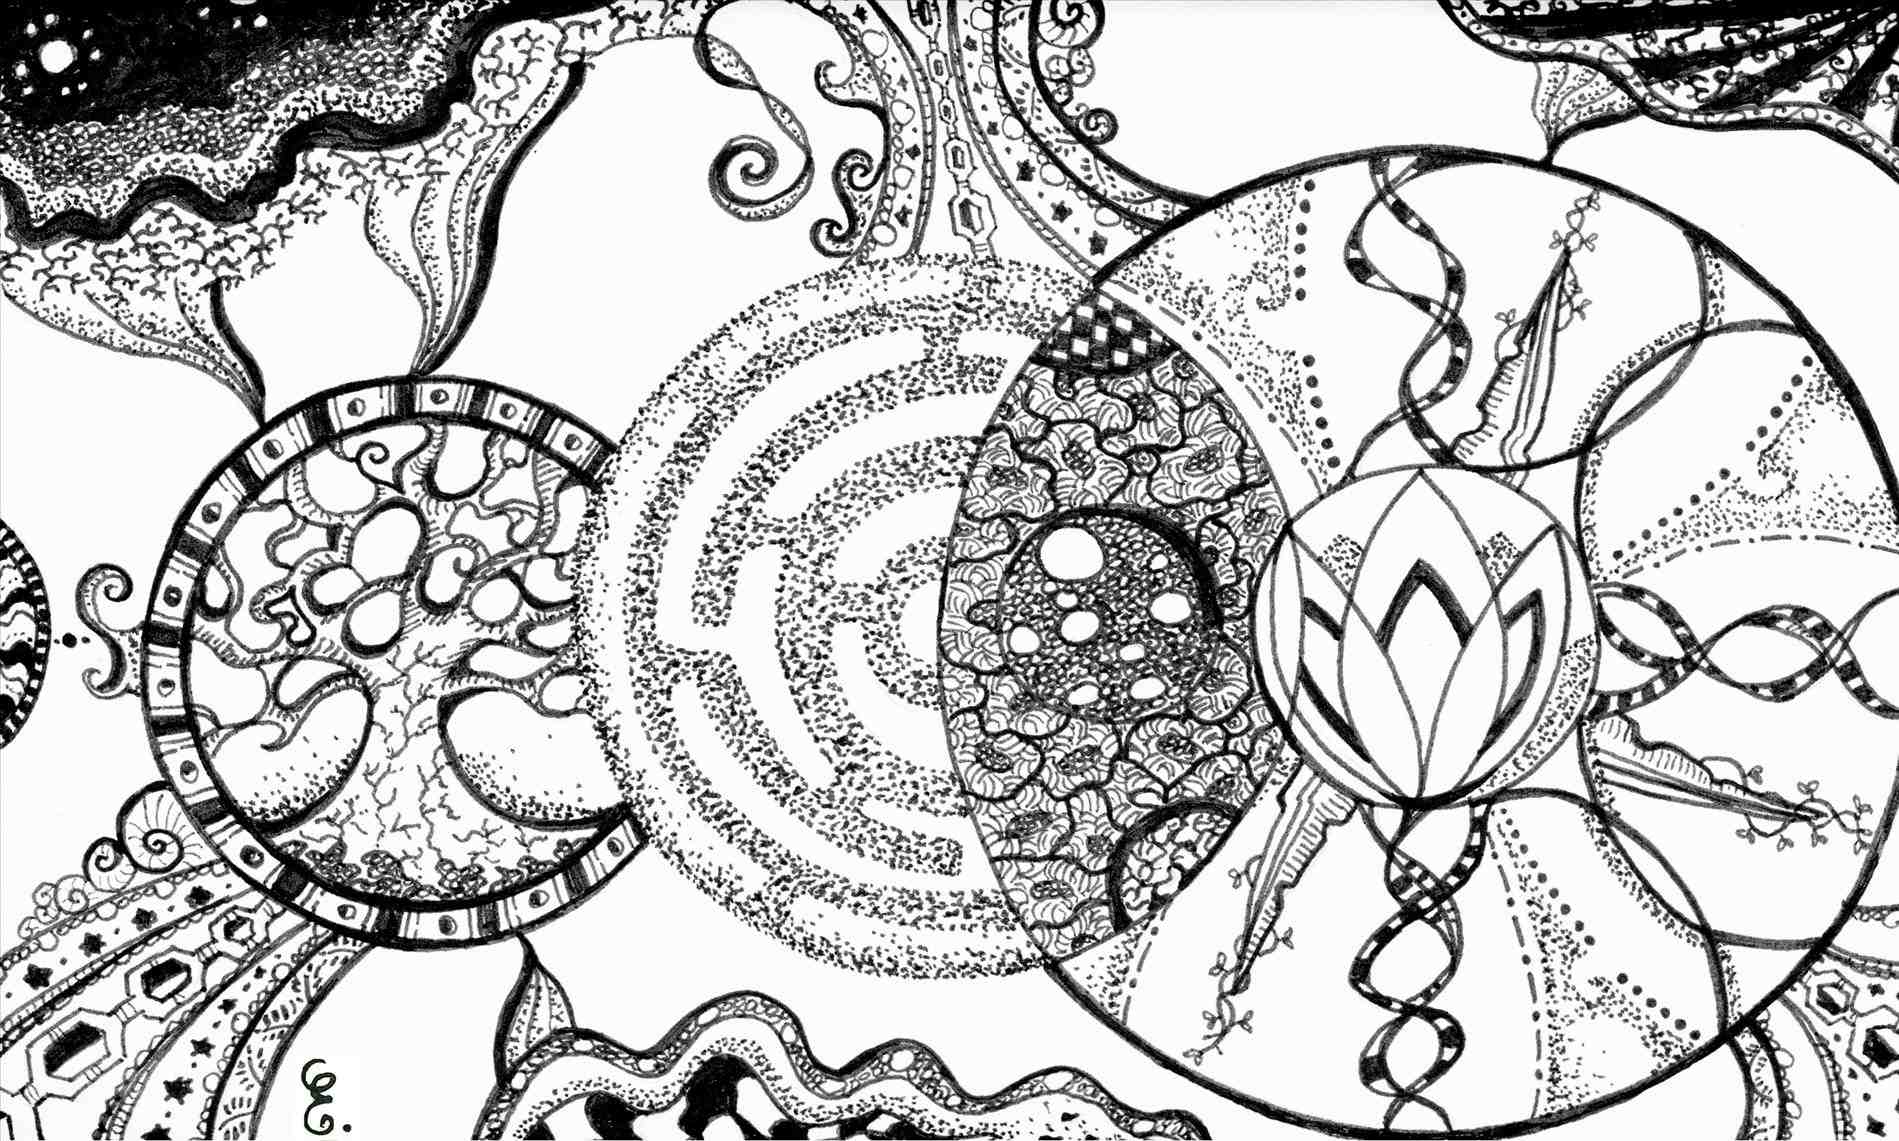 1899x1141 Wallpaper Ocean Waves Drawing Tumblr